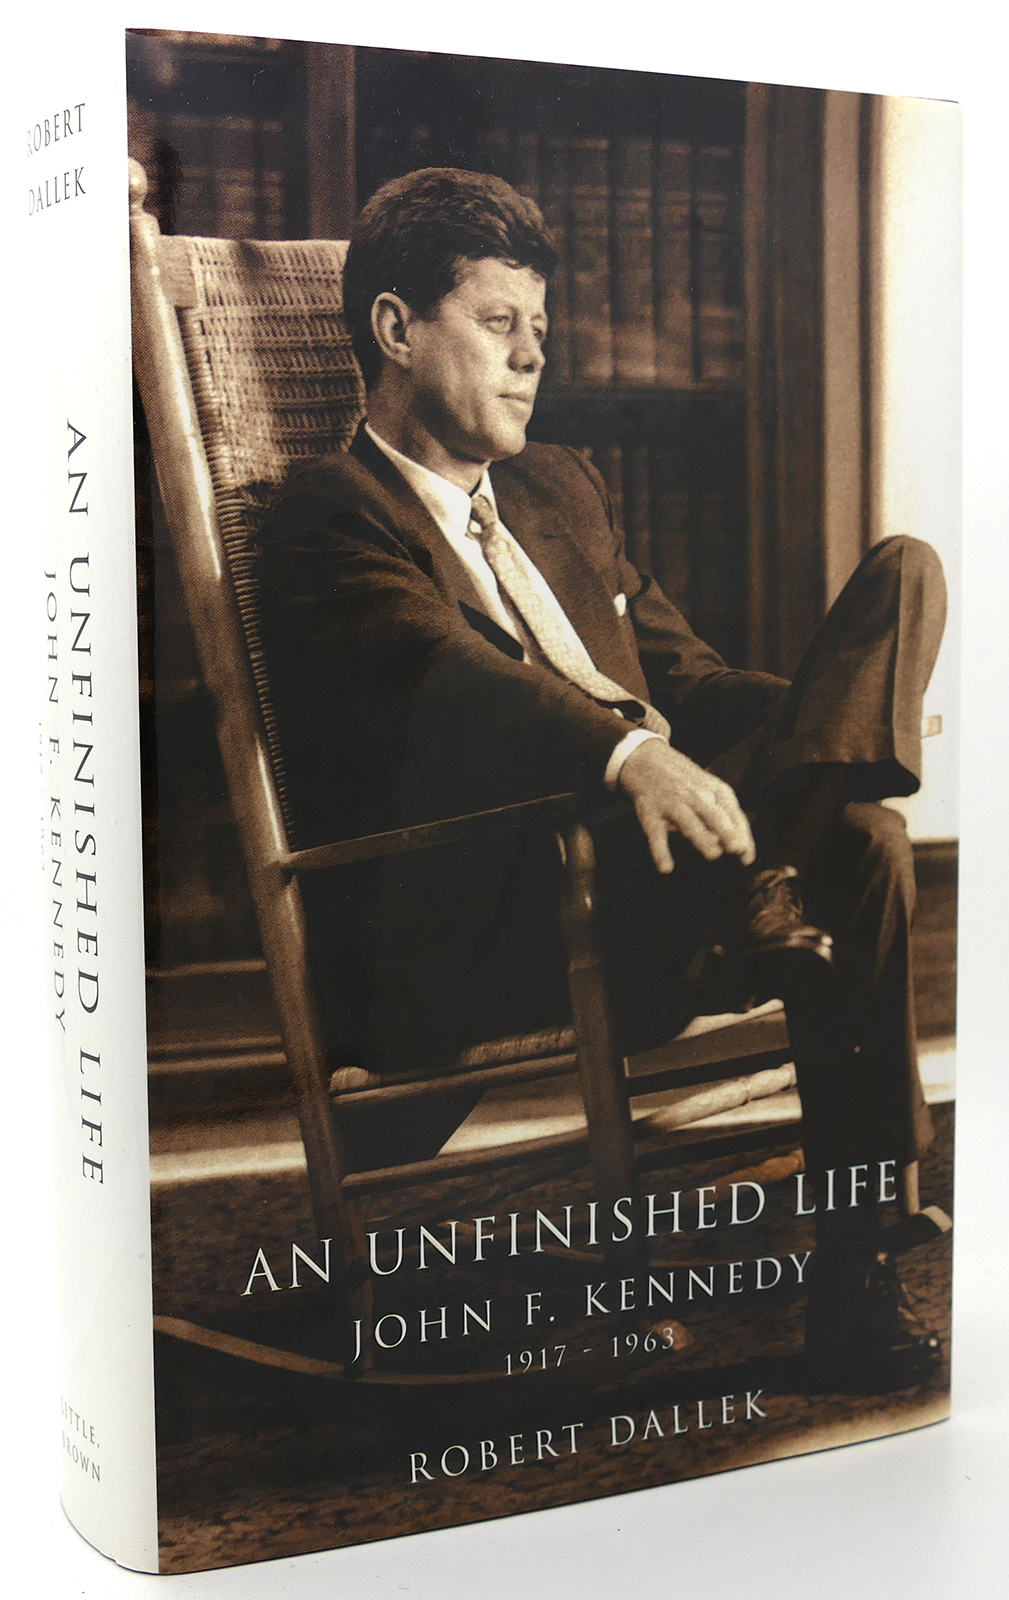 an unfinished life john f kennedy 1917 1963 pdf